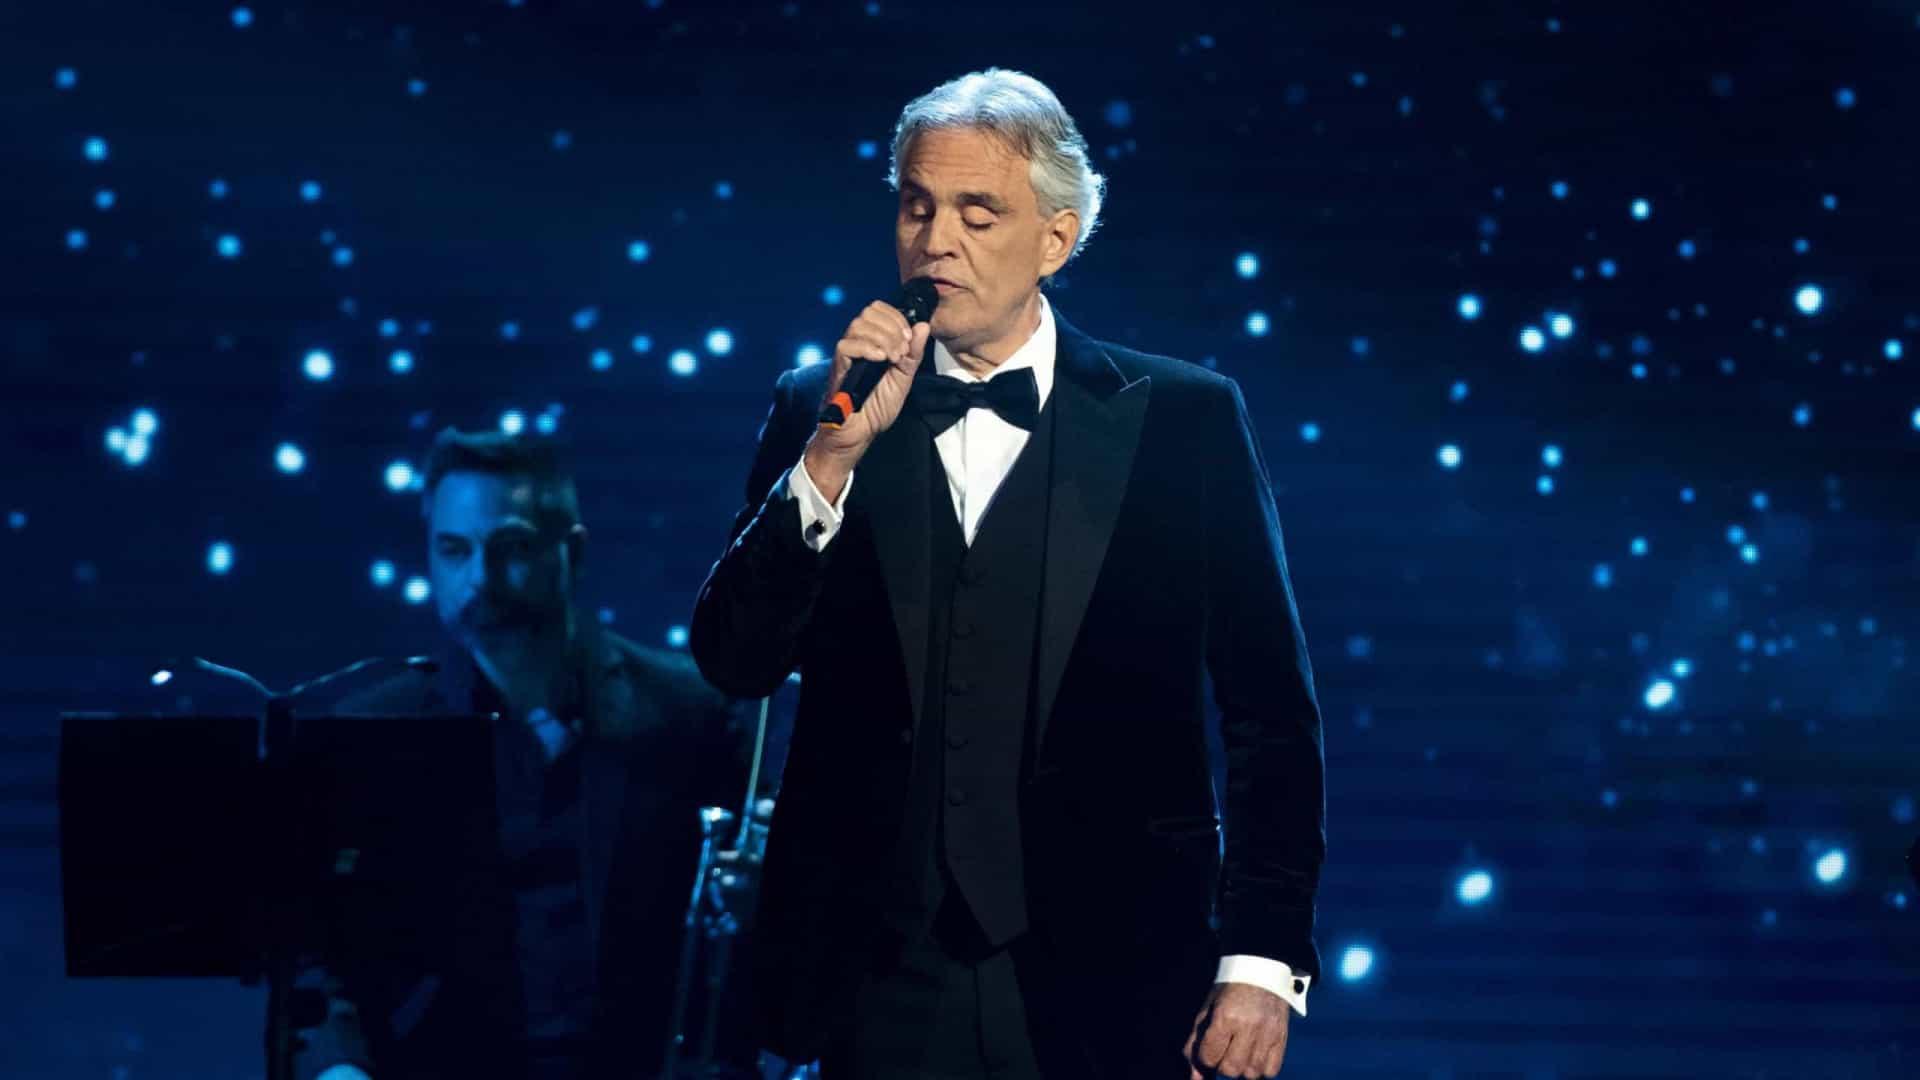 Andrea Bocelli, tenor e compositor italiano, faz aniversário hoje, 22 de setembro